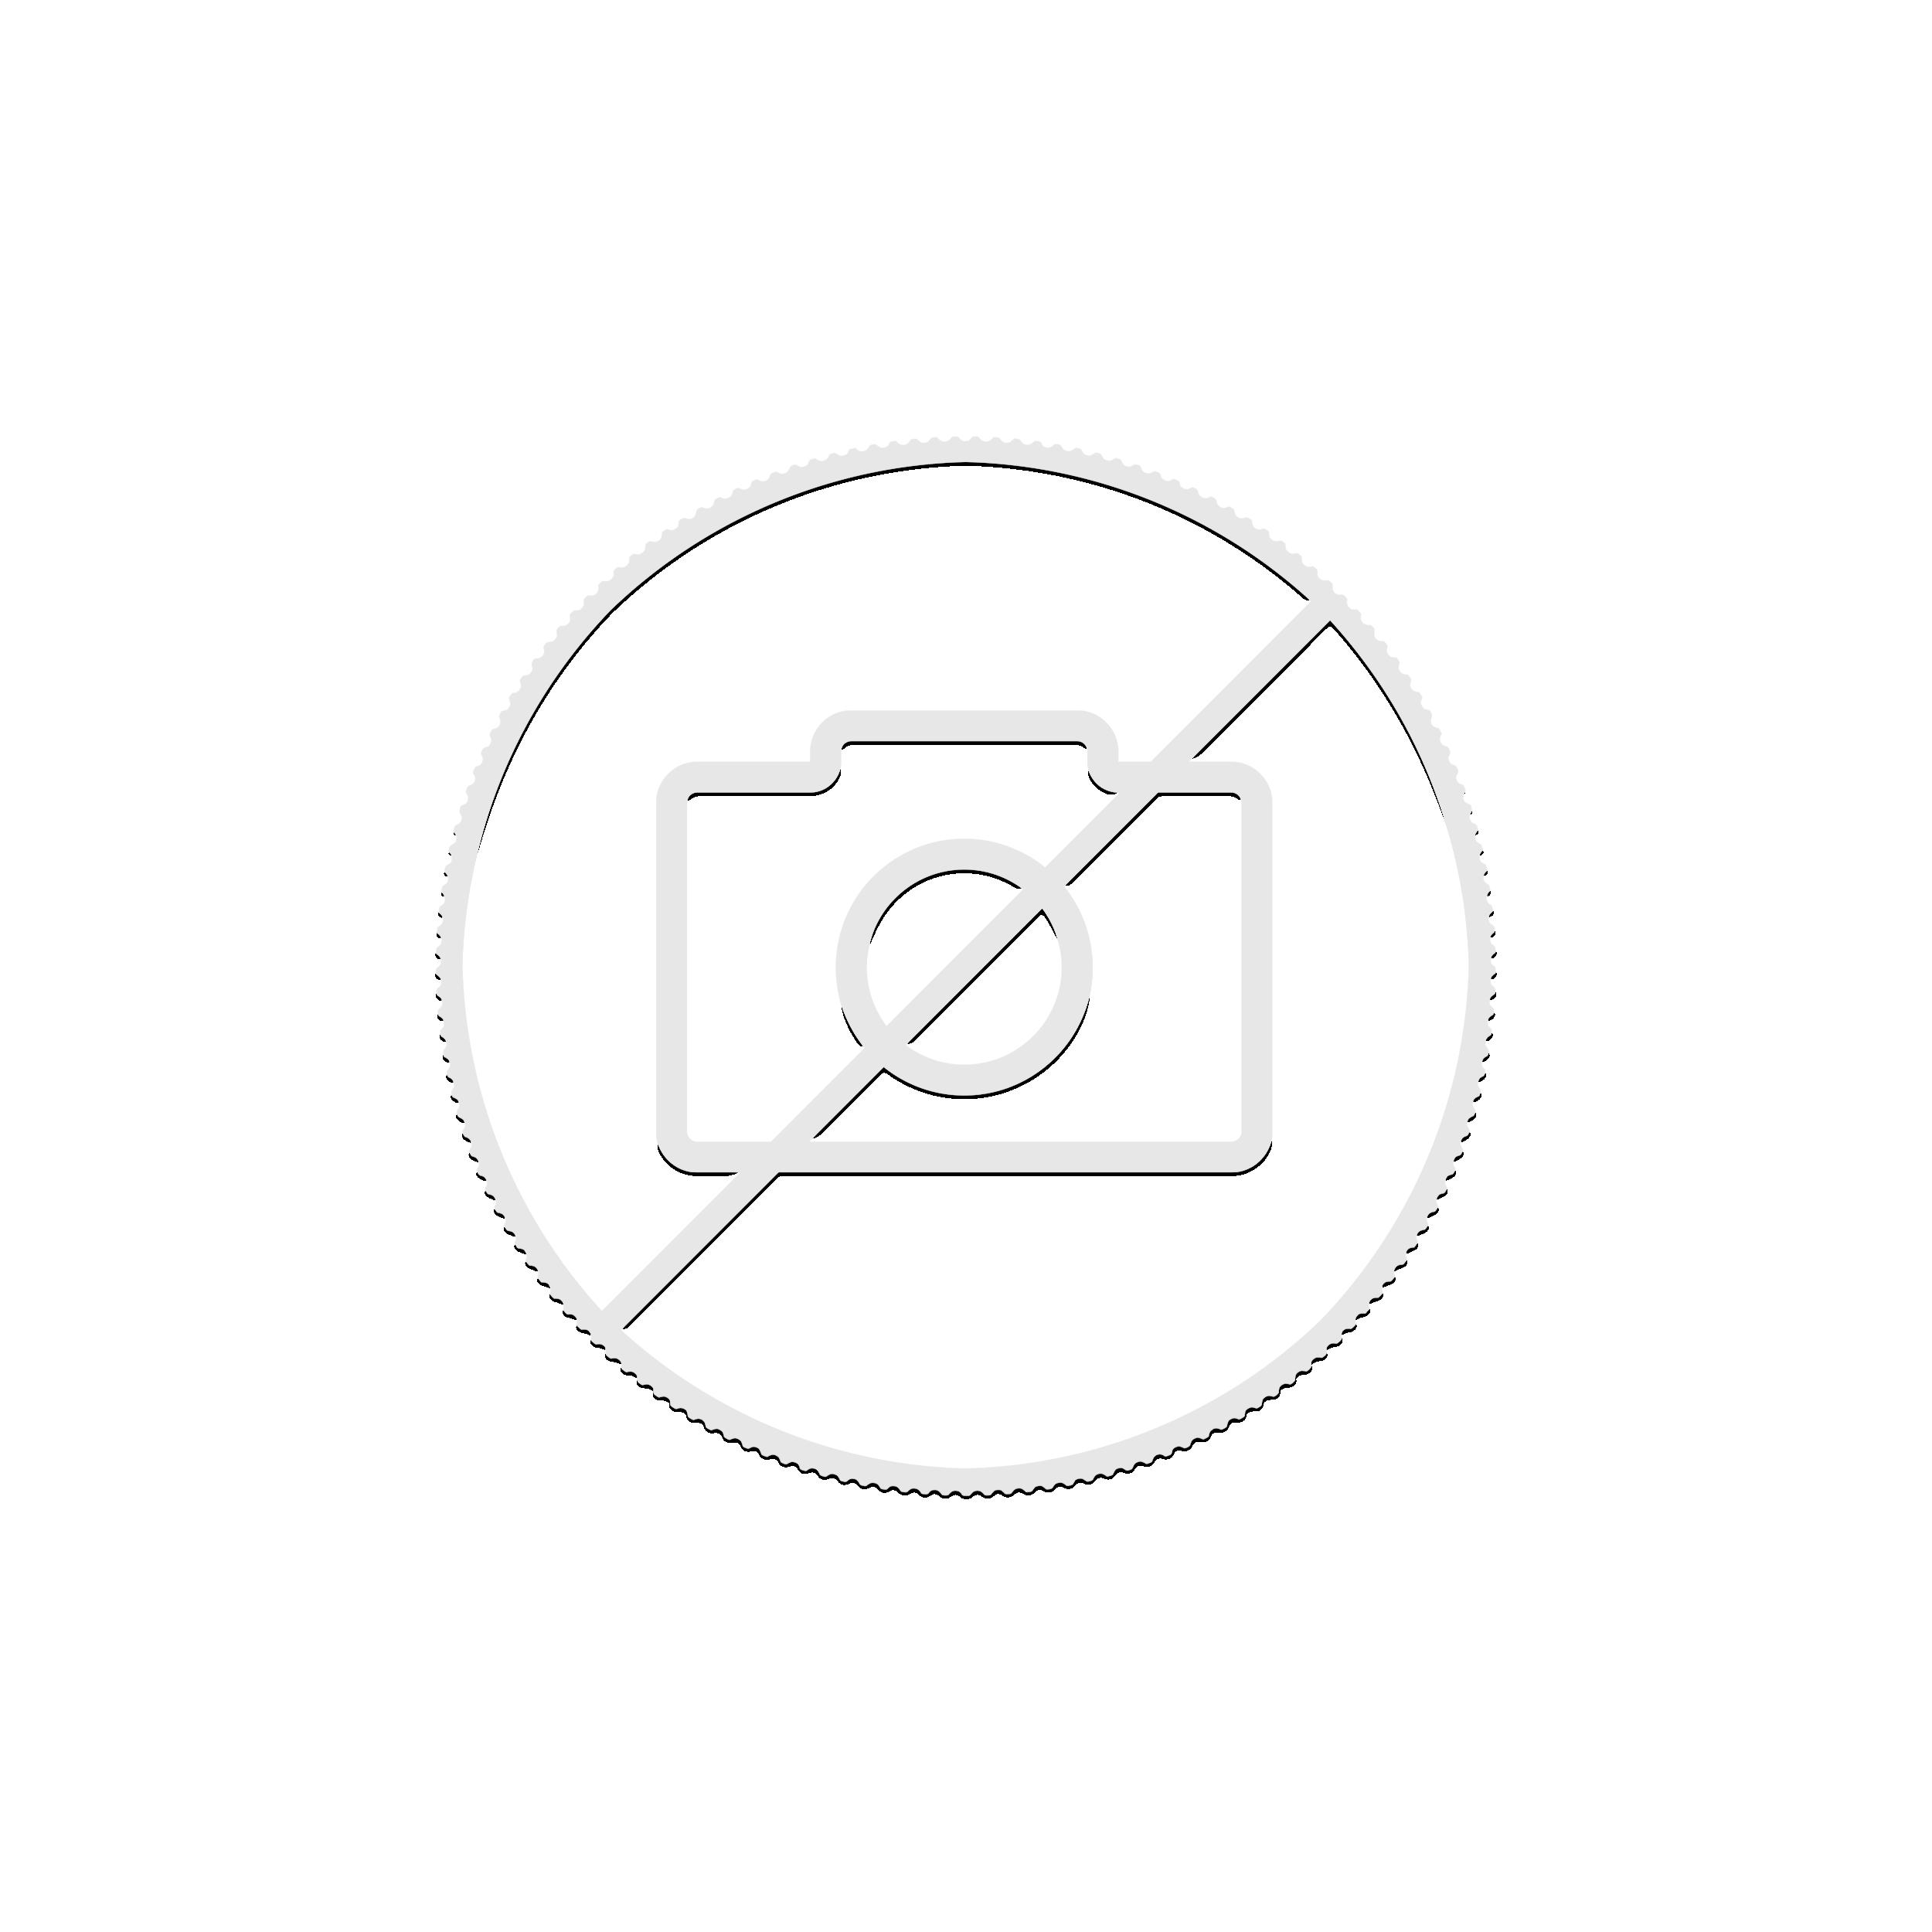 Gold coin Willem van Oranje 1964